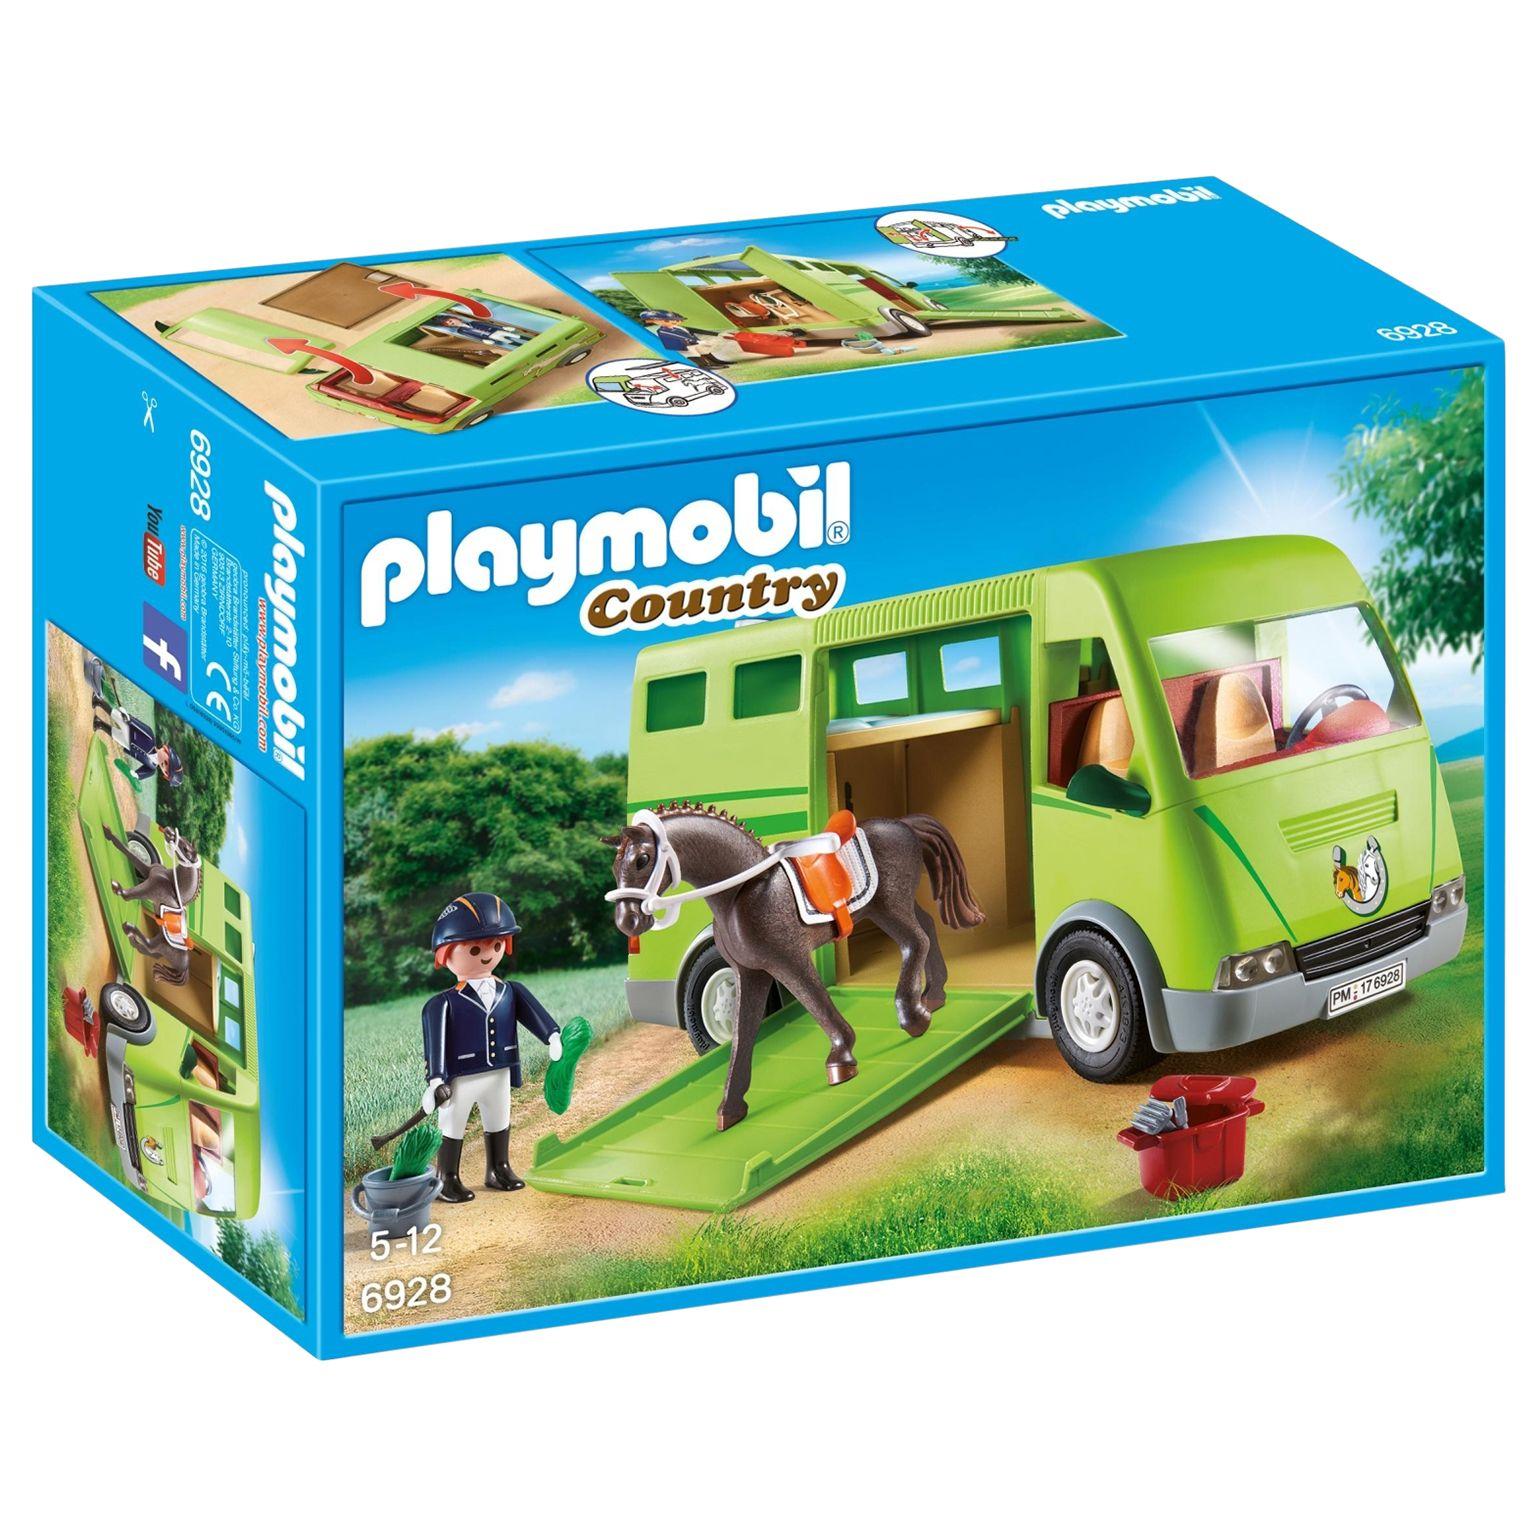 PLAYMOBIL Playmobil Country 6928 Horse Box